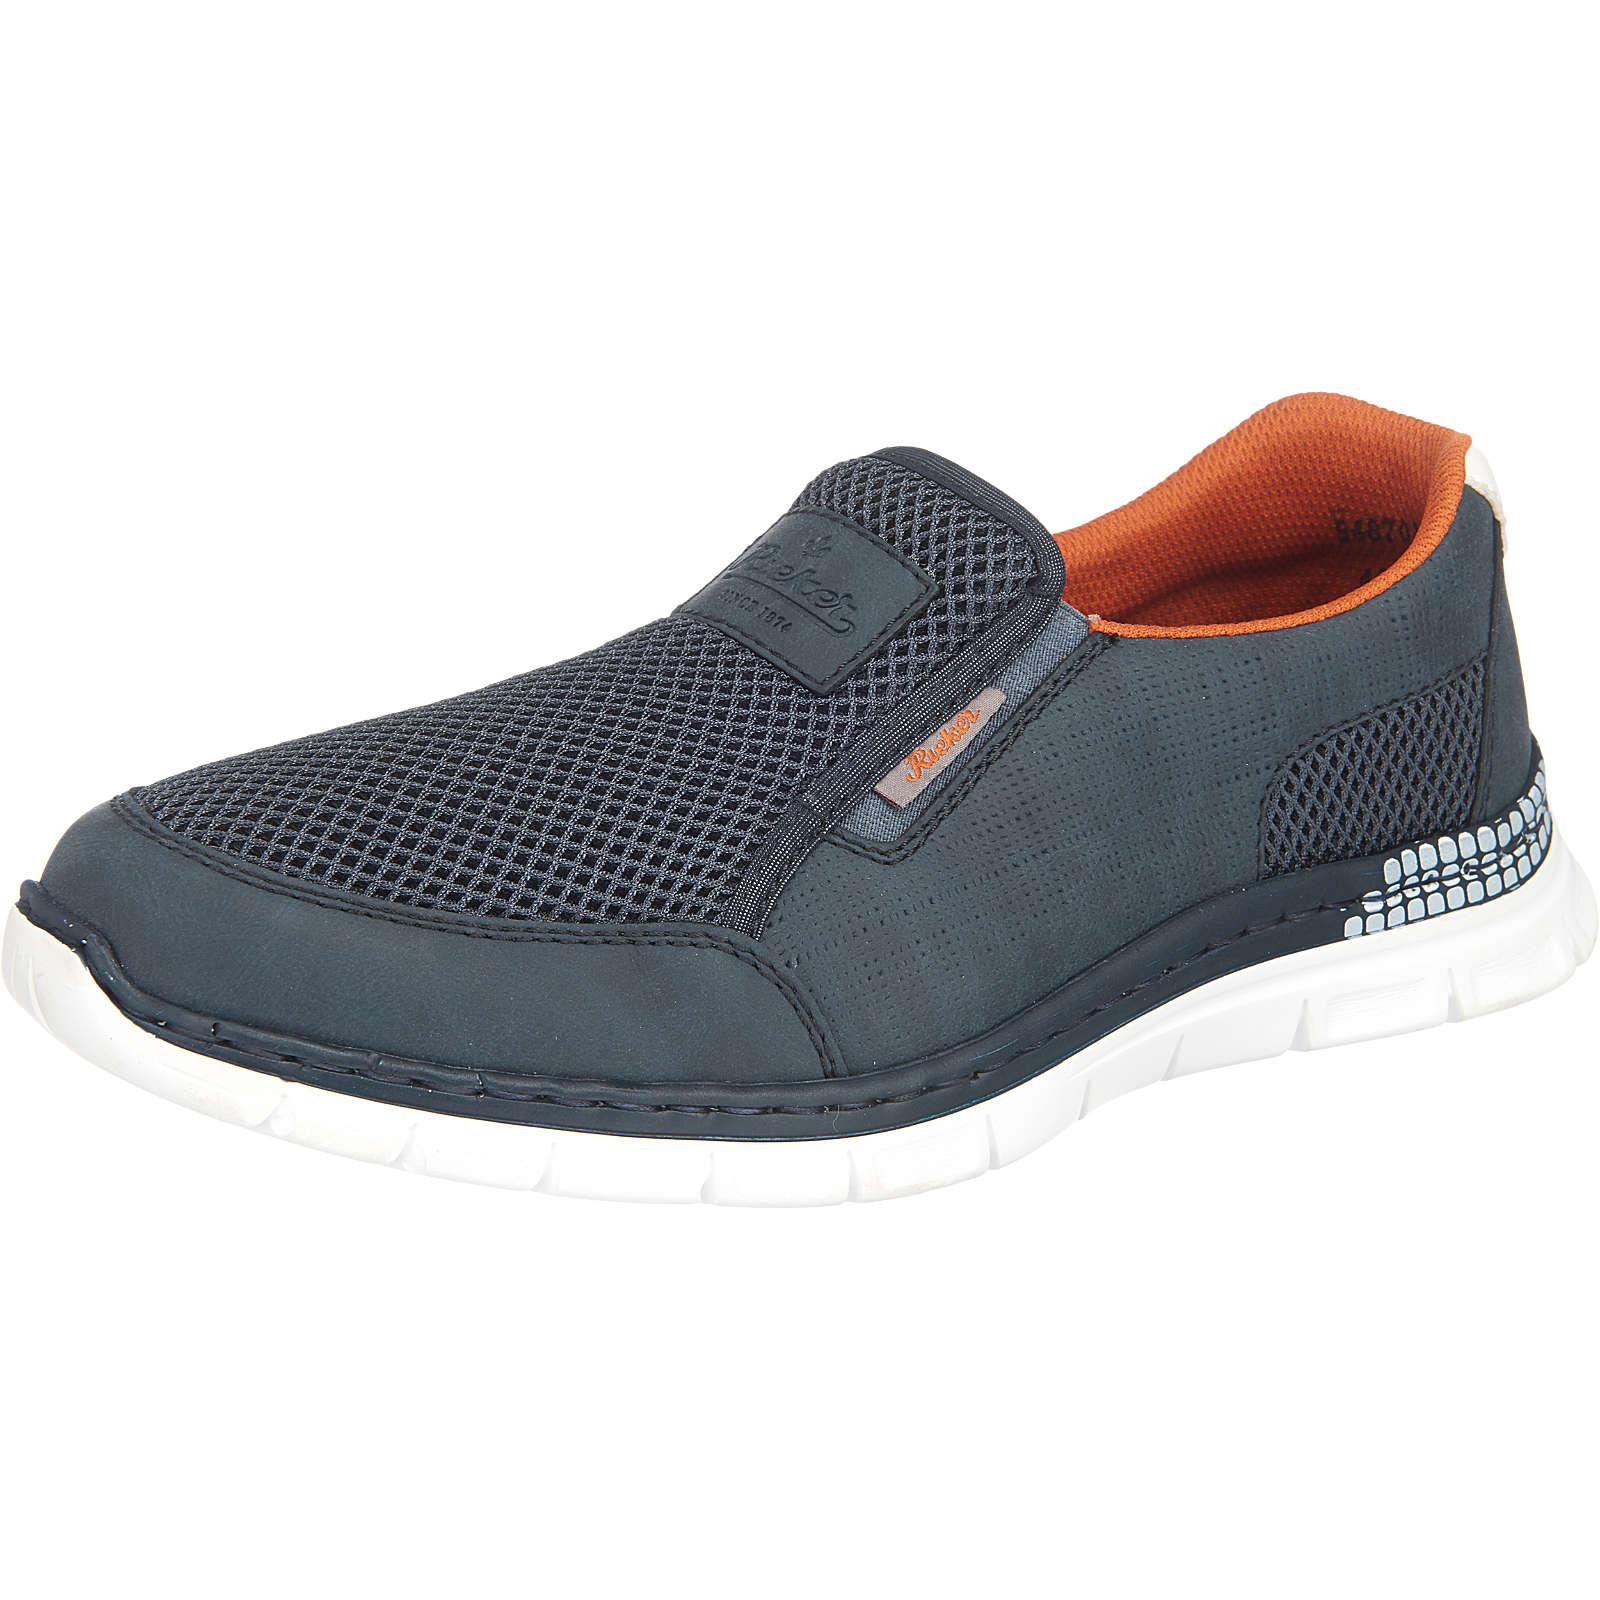 rieker Sneakers Low blau Herren Gr. 41